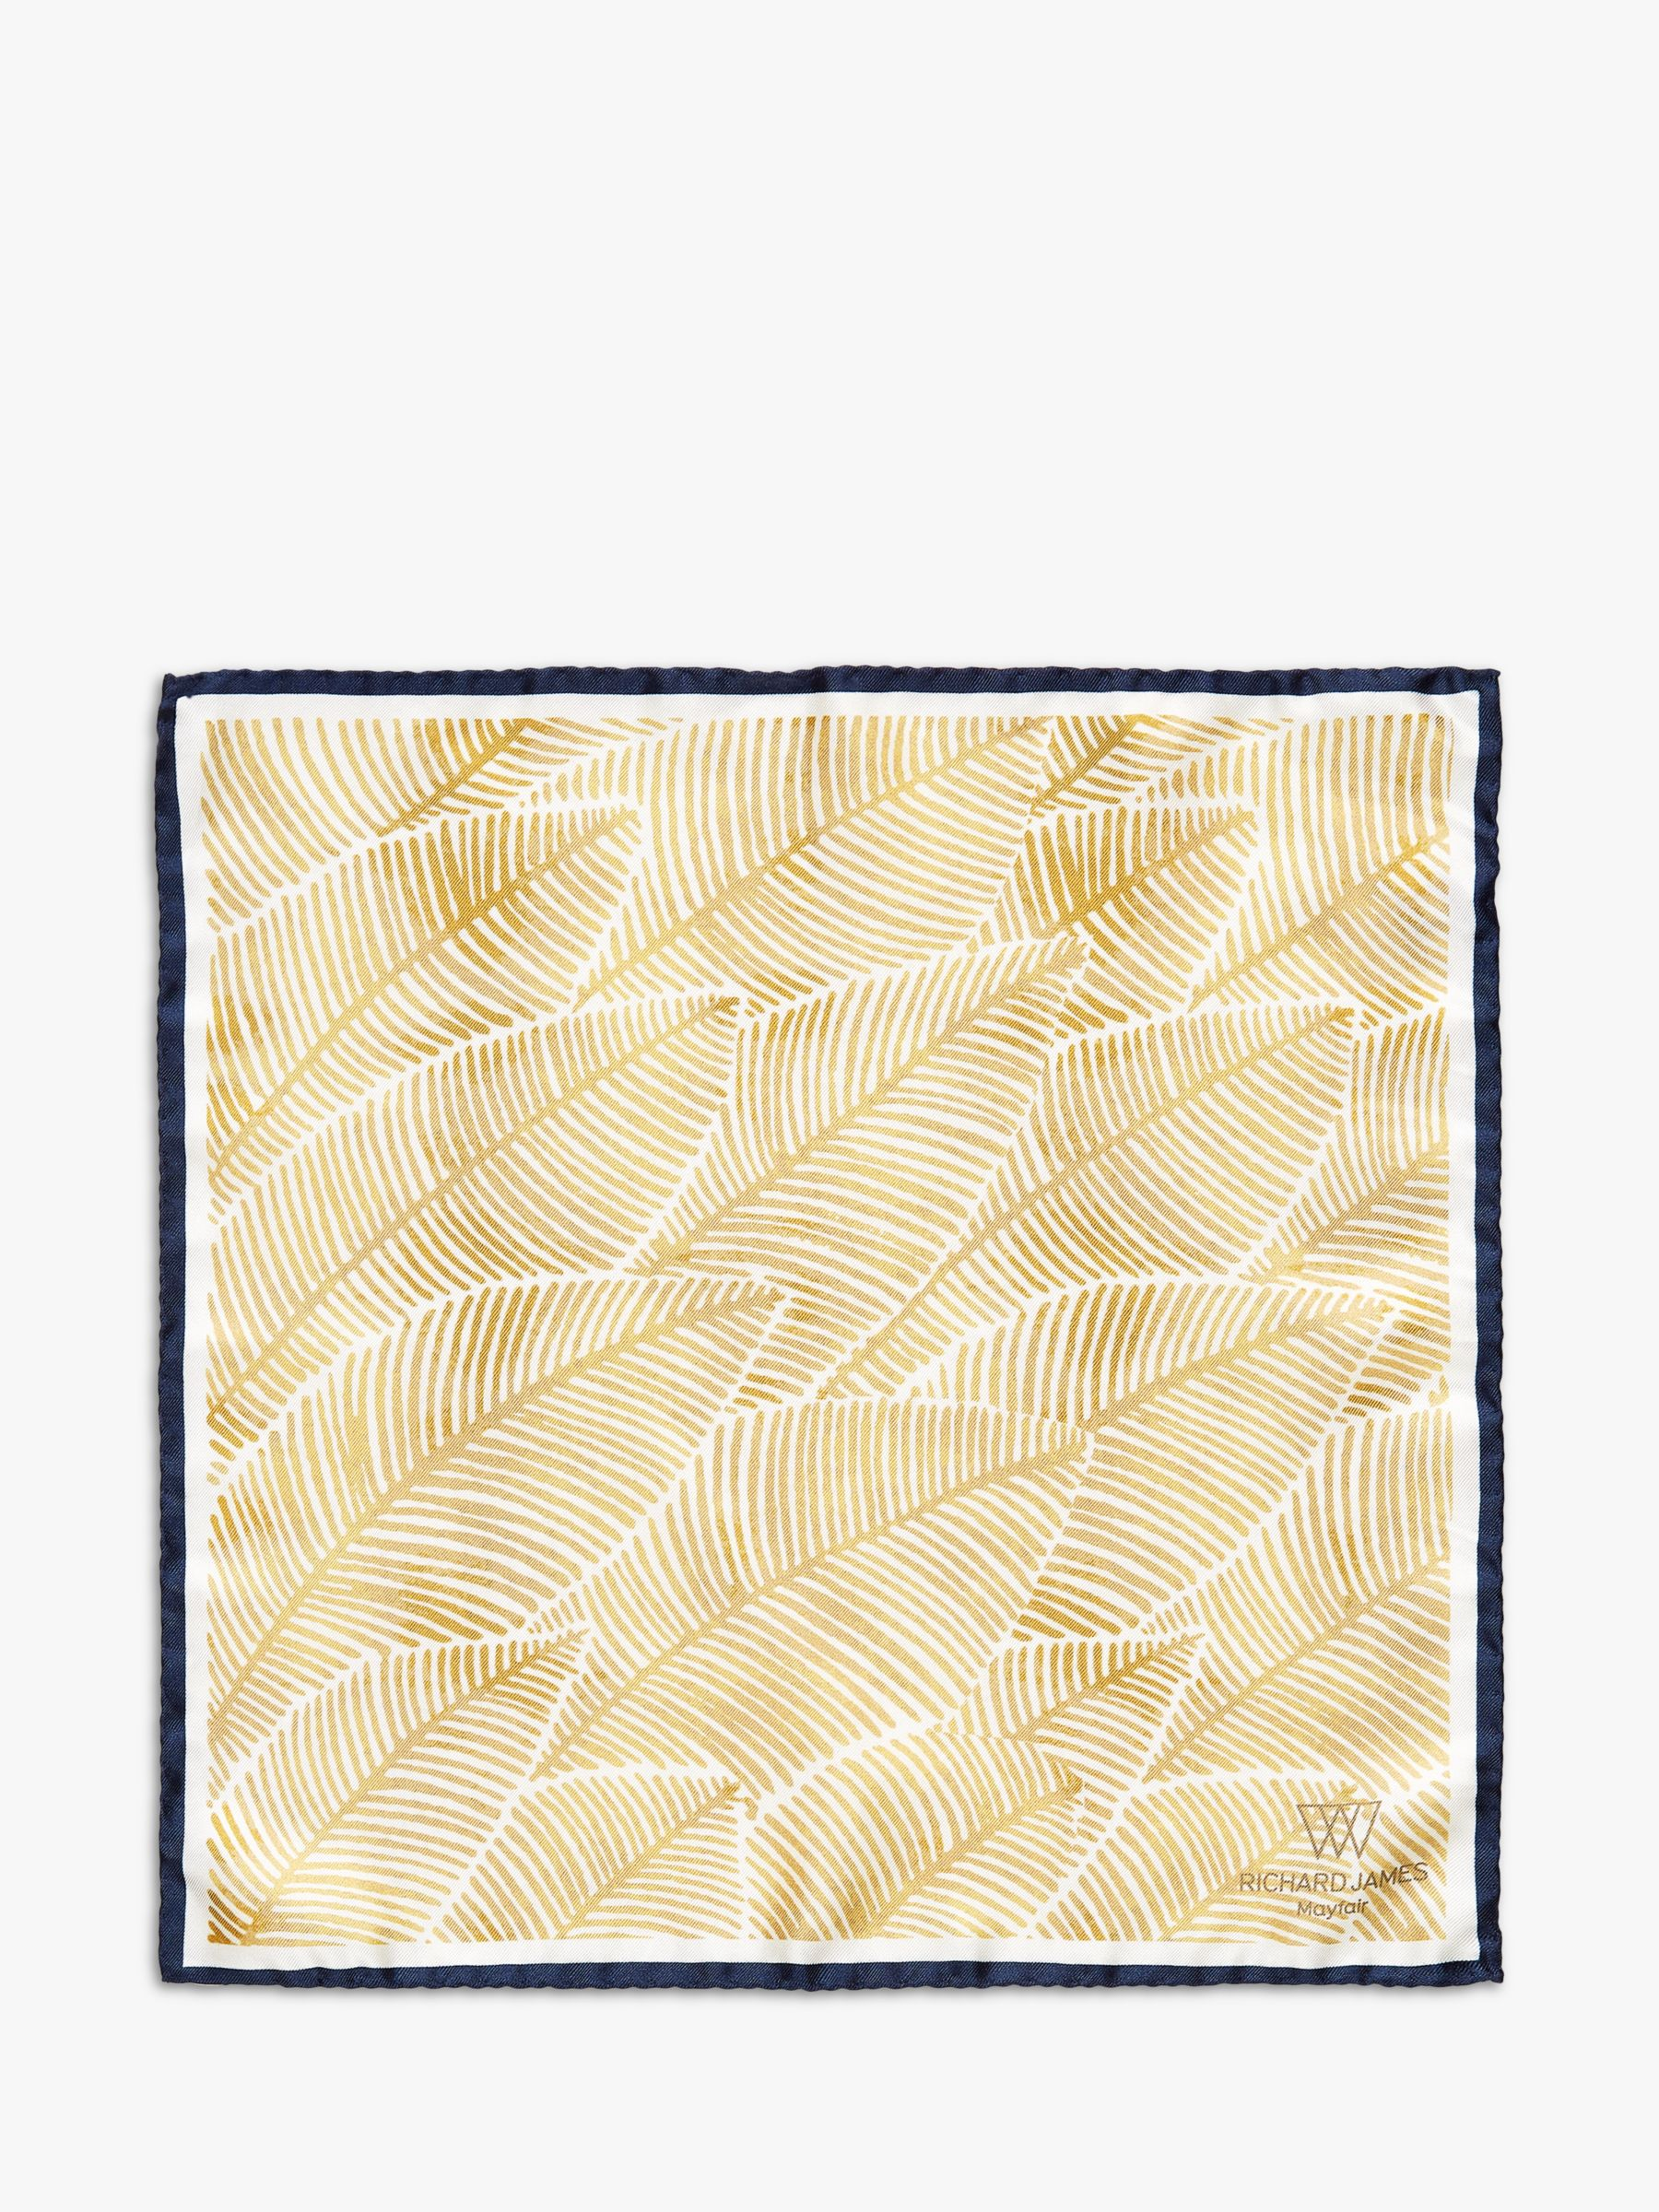 Richard James Mayfair Richard James Mayfair Wash Leaves Silk Pocket Square, Gold